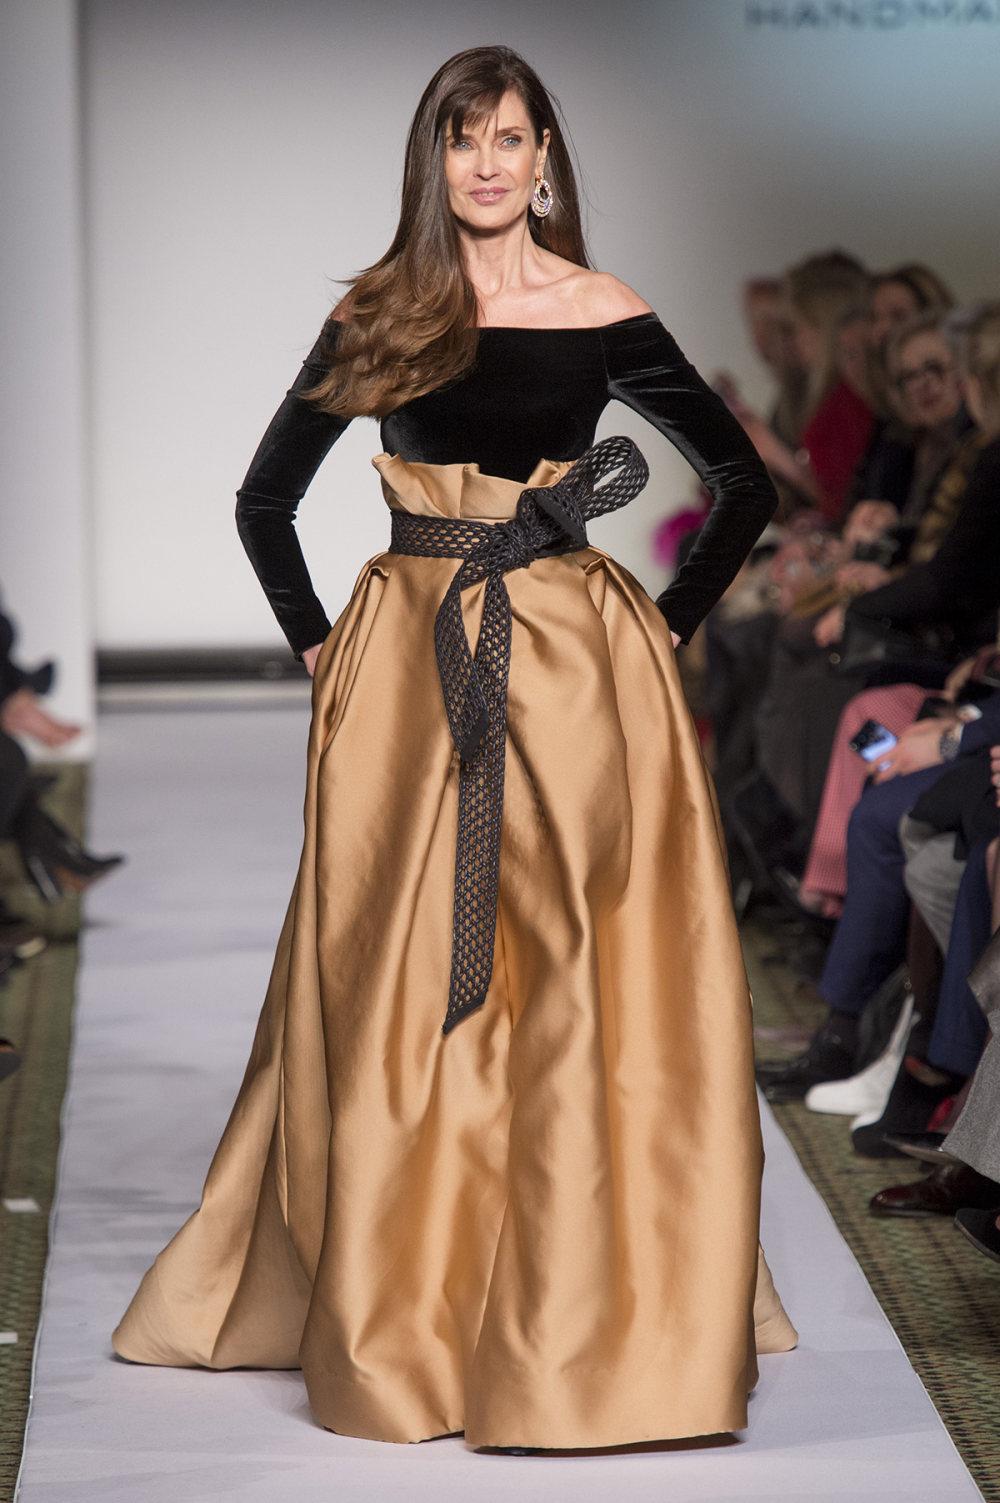 Carolina Herrera时装系列用鲜艳的颜色充满智能的黑白色调-49.jpg